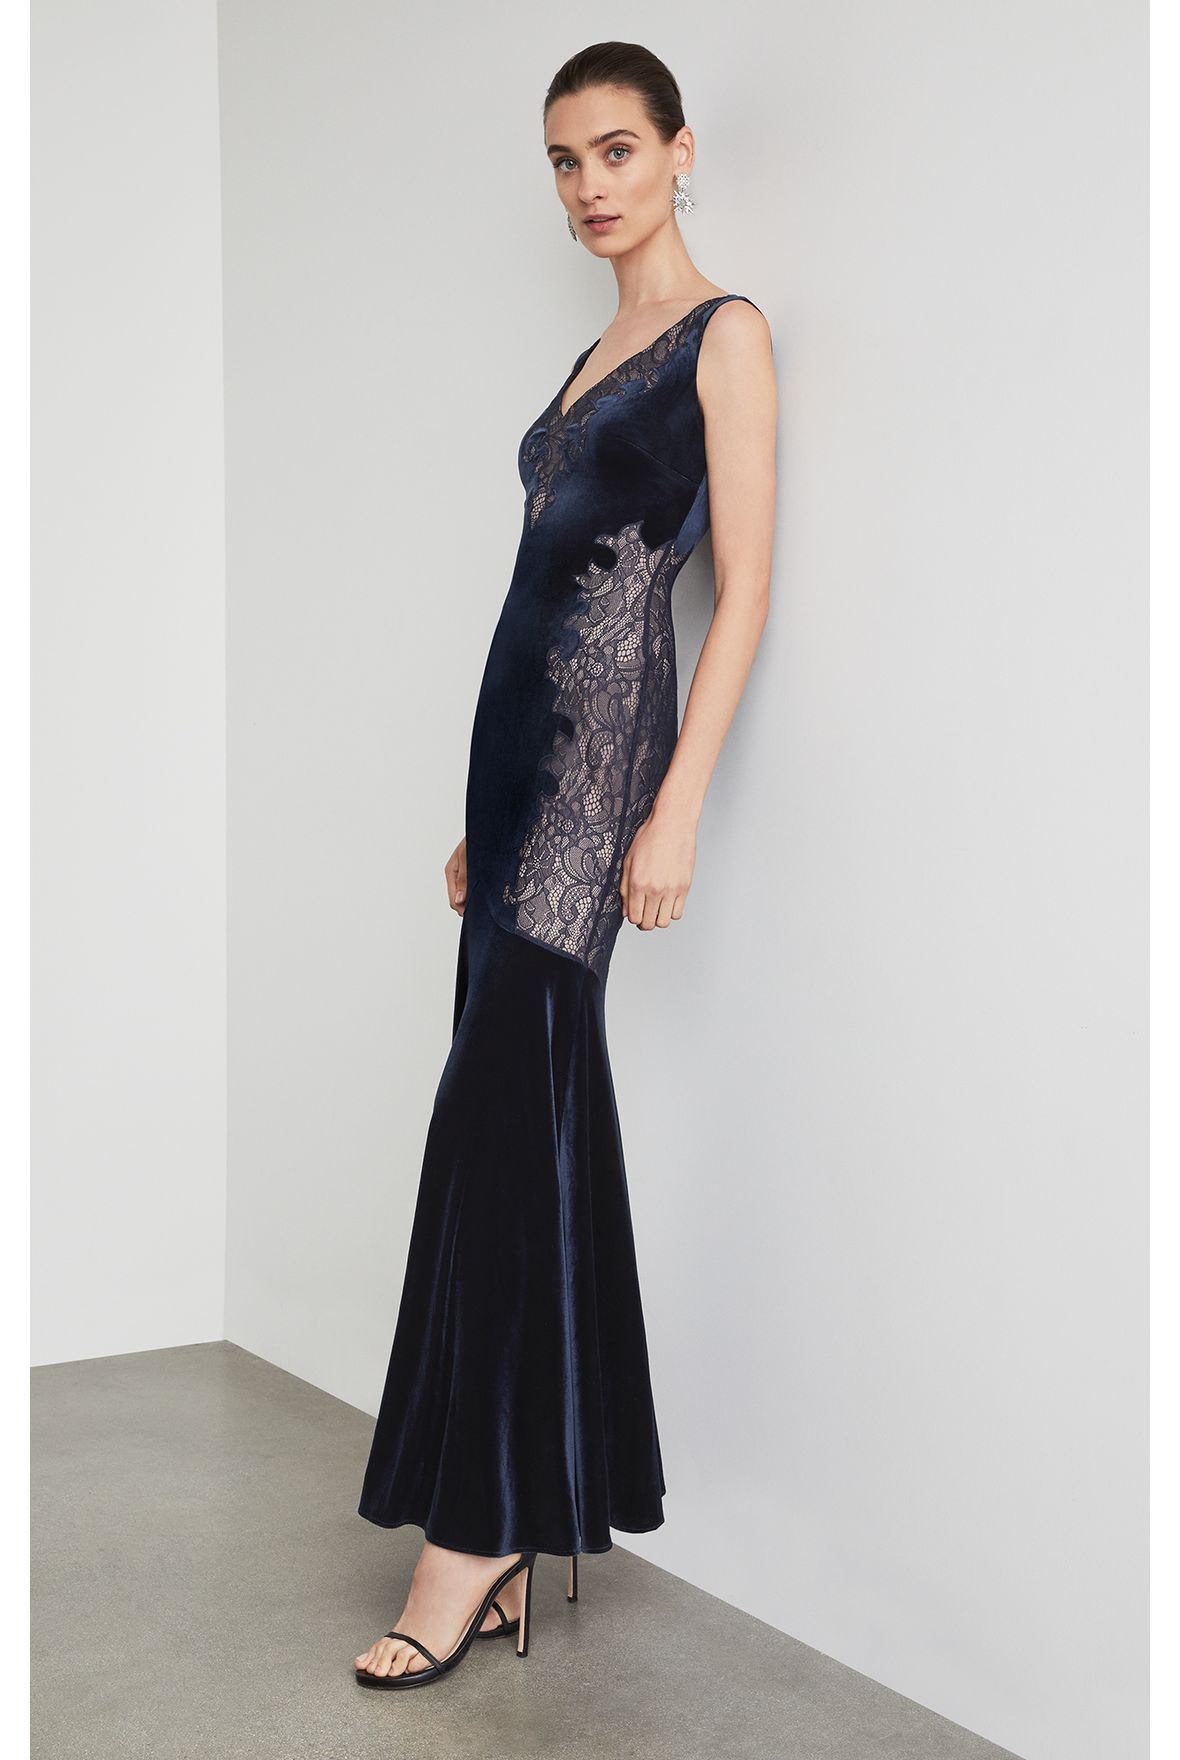 Vestido-largo-de-velvet-GFH6170256_411_c